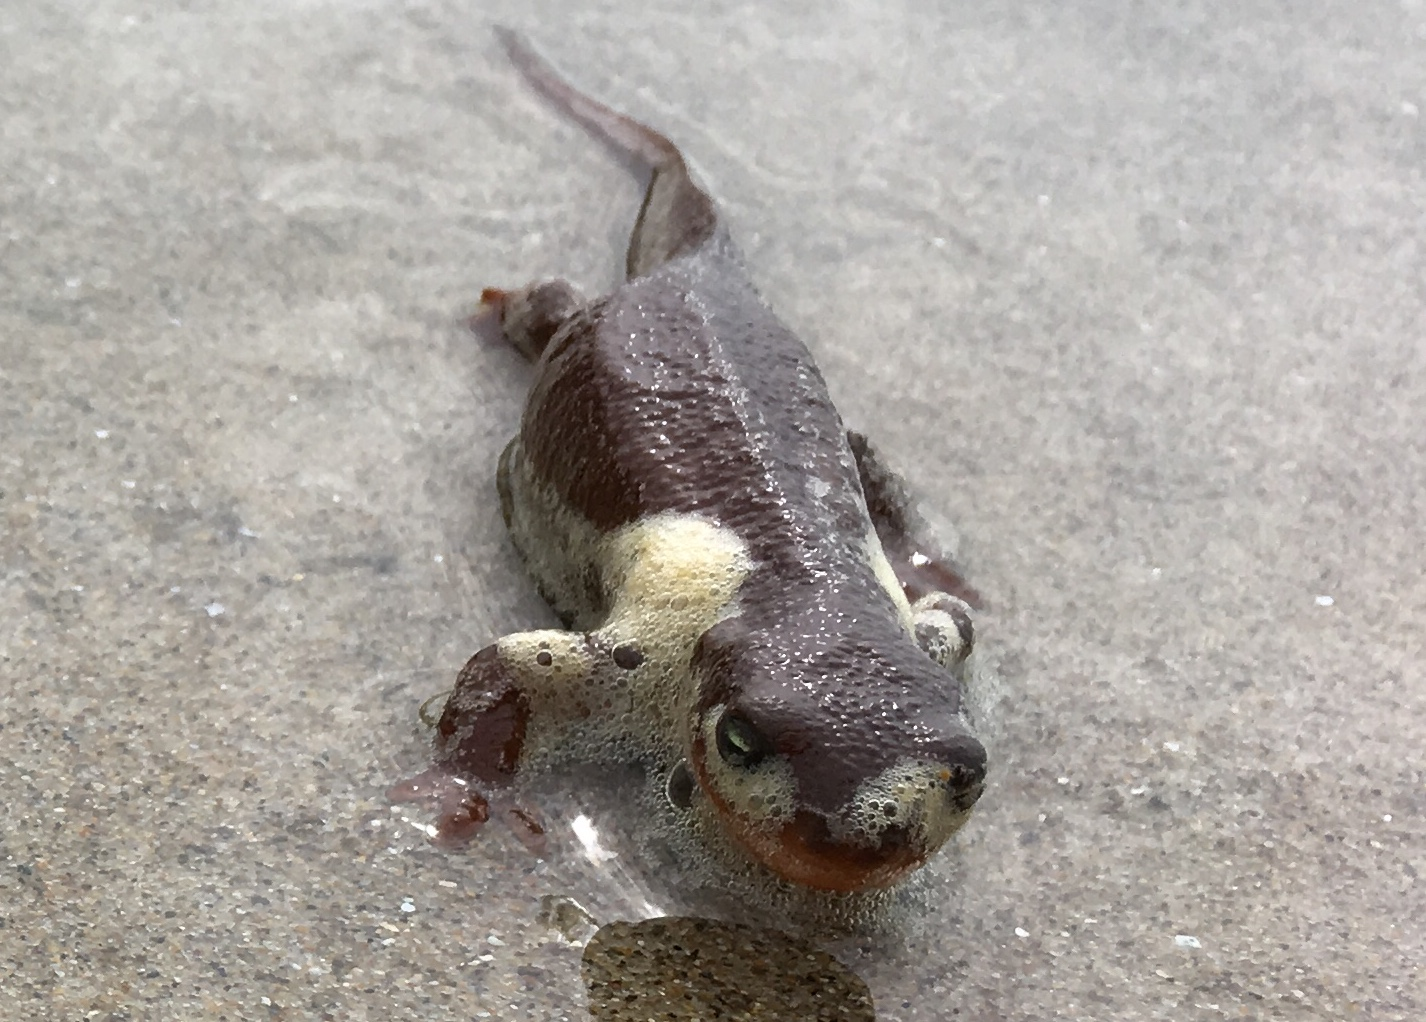 Found this little salamander covered in sea foam. Tillicum Beach Campground, OR.